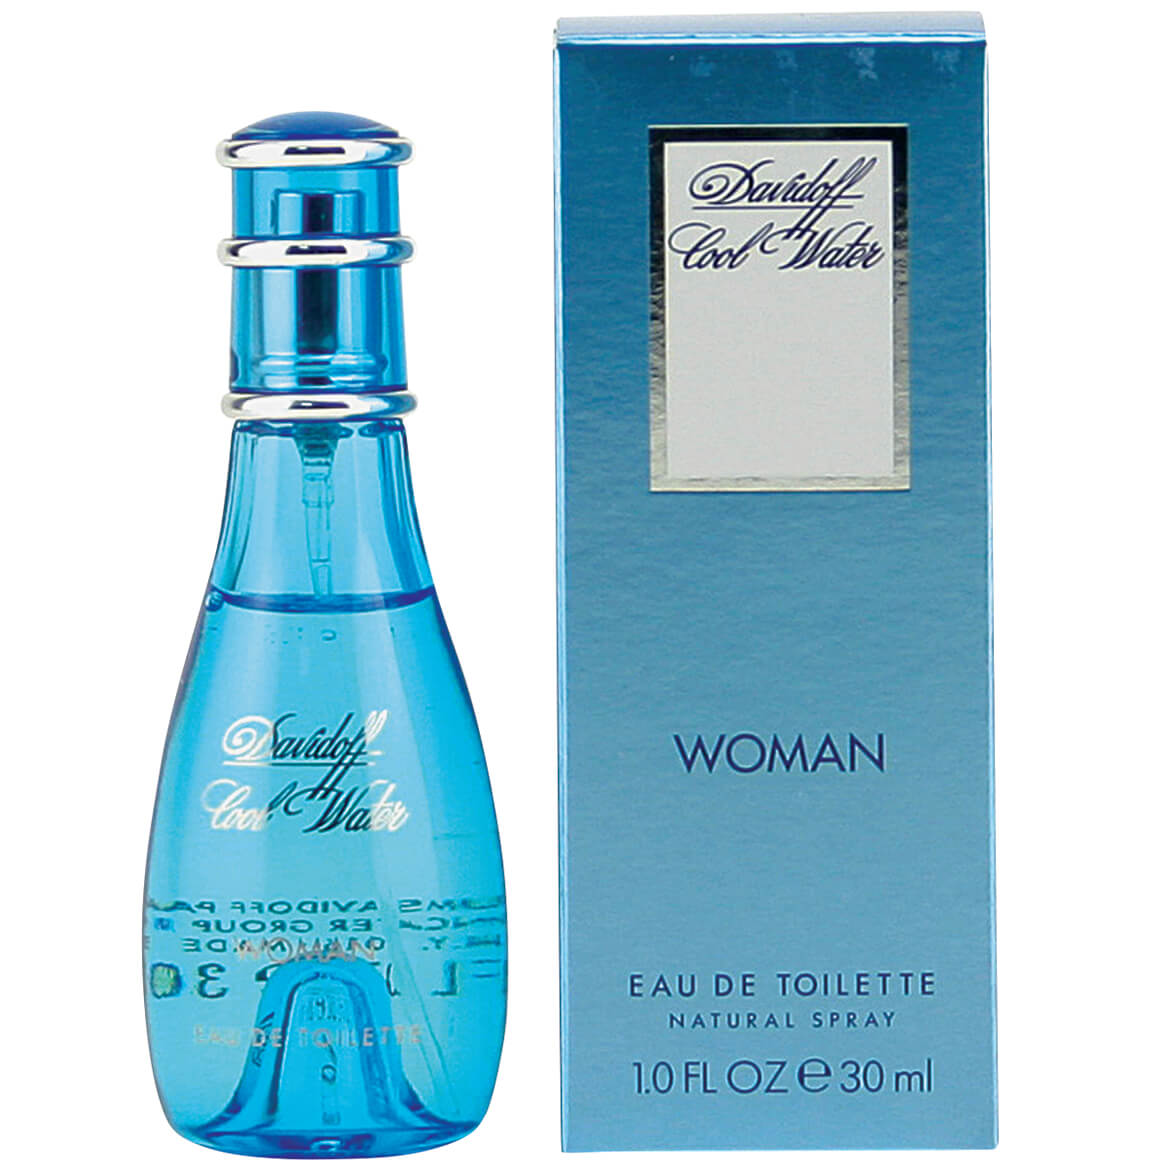 Davidoff Cool Water for Women EDT, 1 oz.-366832